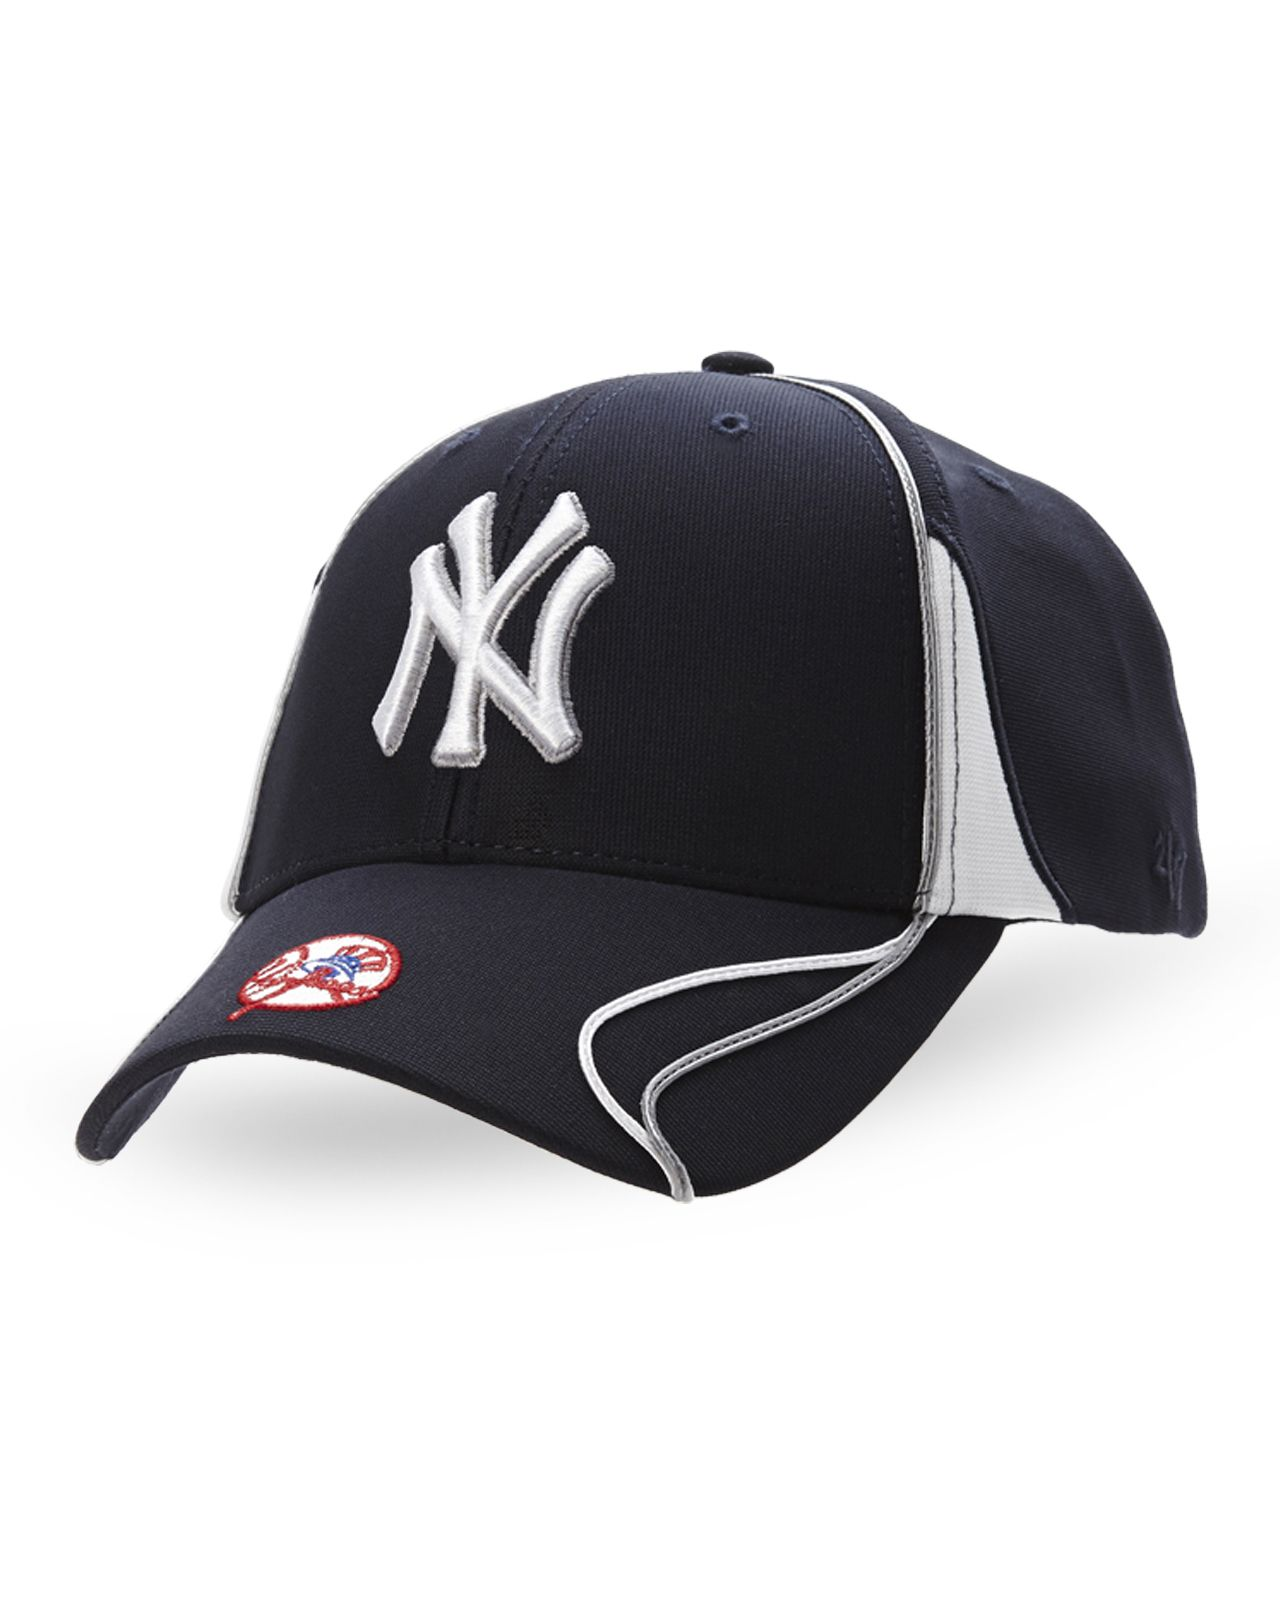 New York Yankees Vortex Baseball Cap  6c49cd358f9